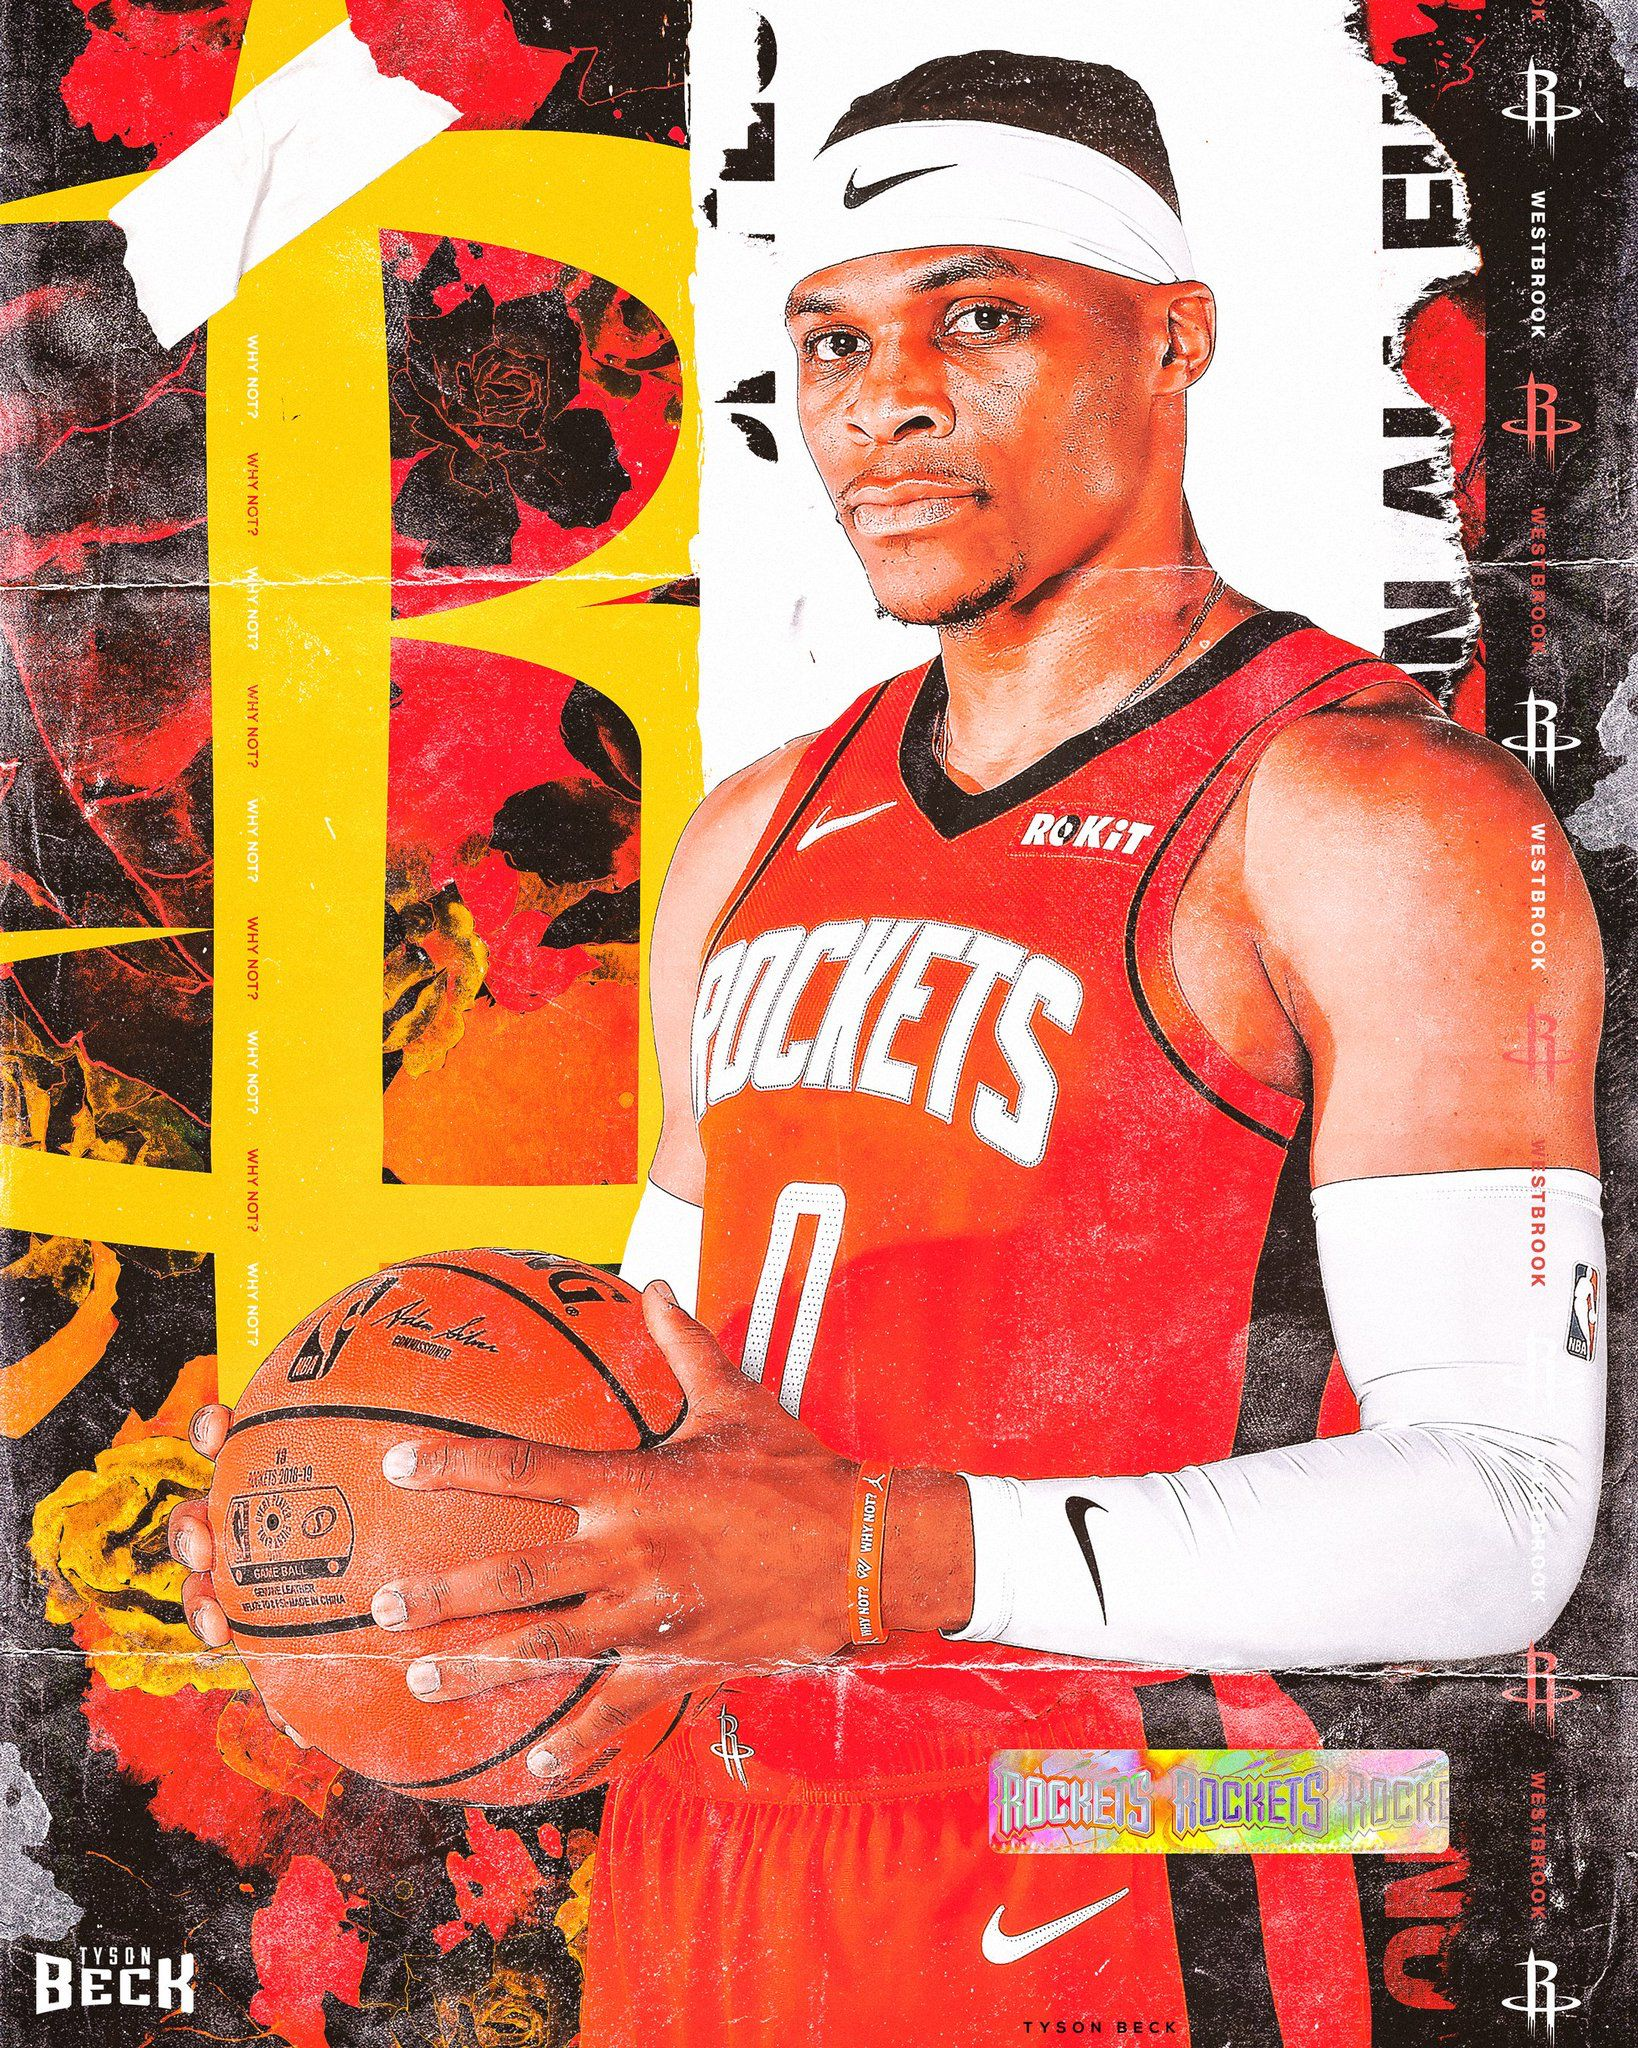 Pin by Blkface on Basketball Mvp basketball